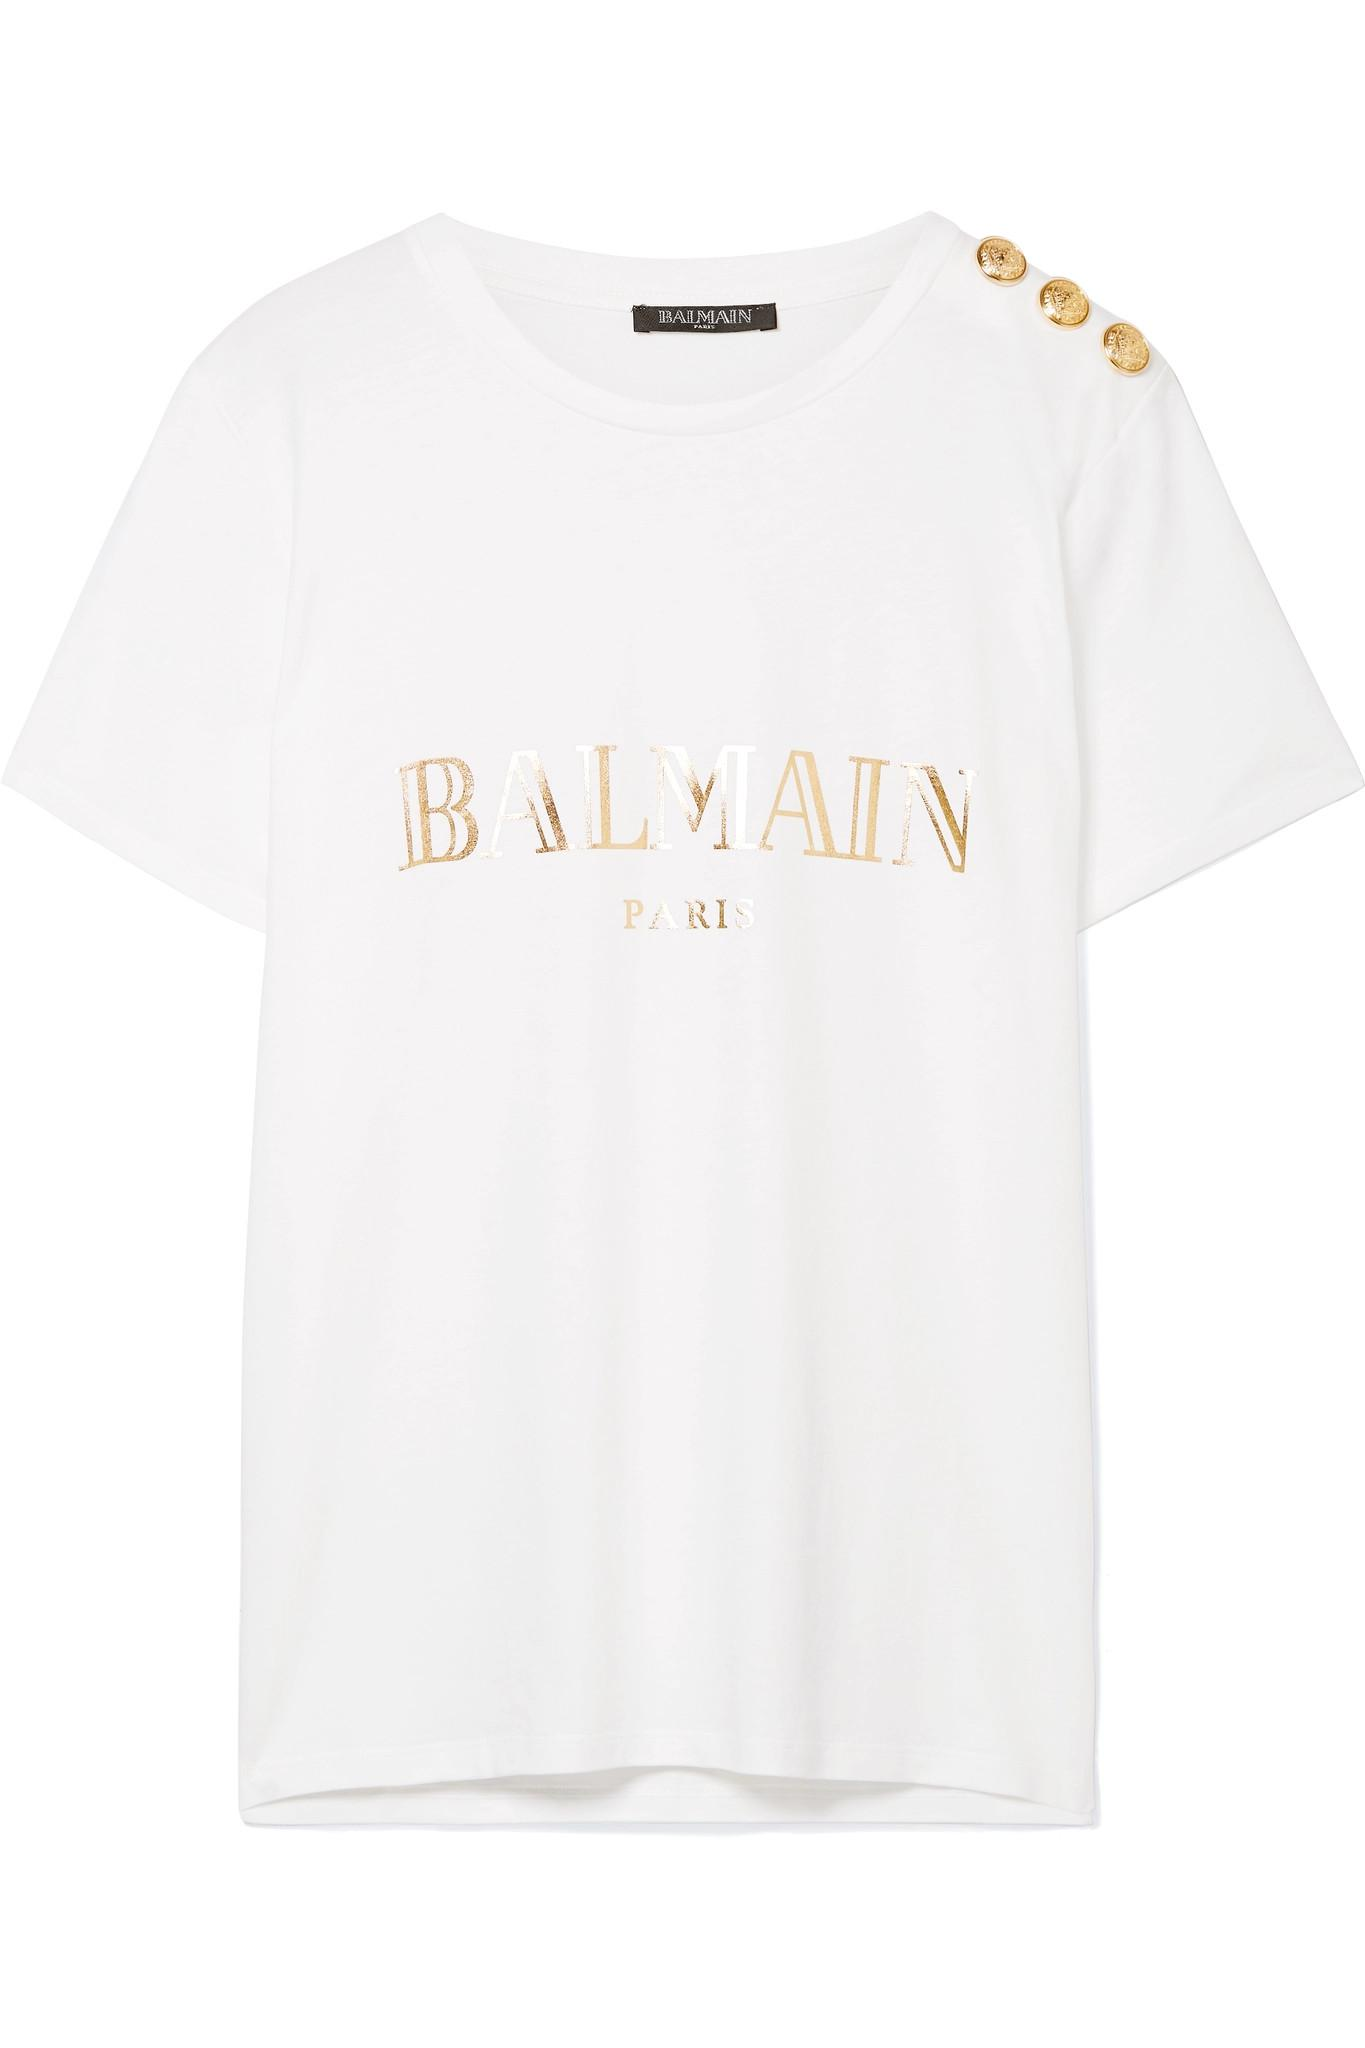 5e0875b8 Balmain - White Button-embellished Printed Cotton-jersey T-shirt - Lyst.  View fullscreen